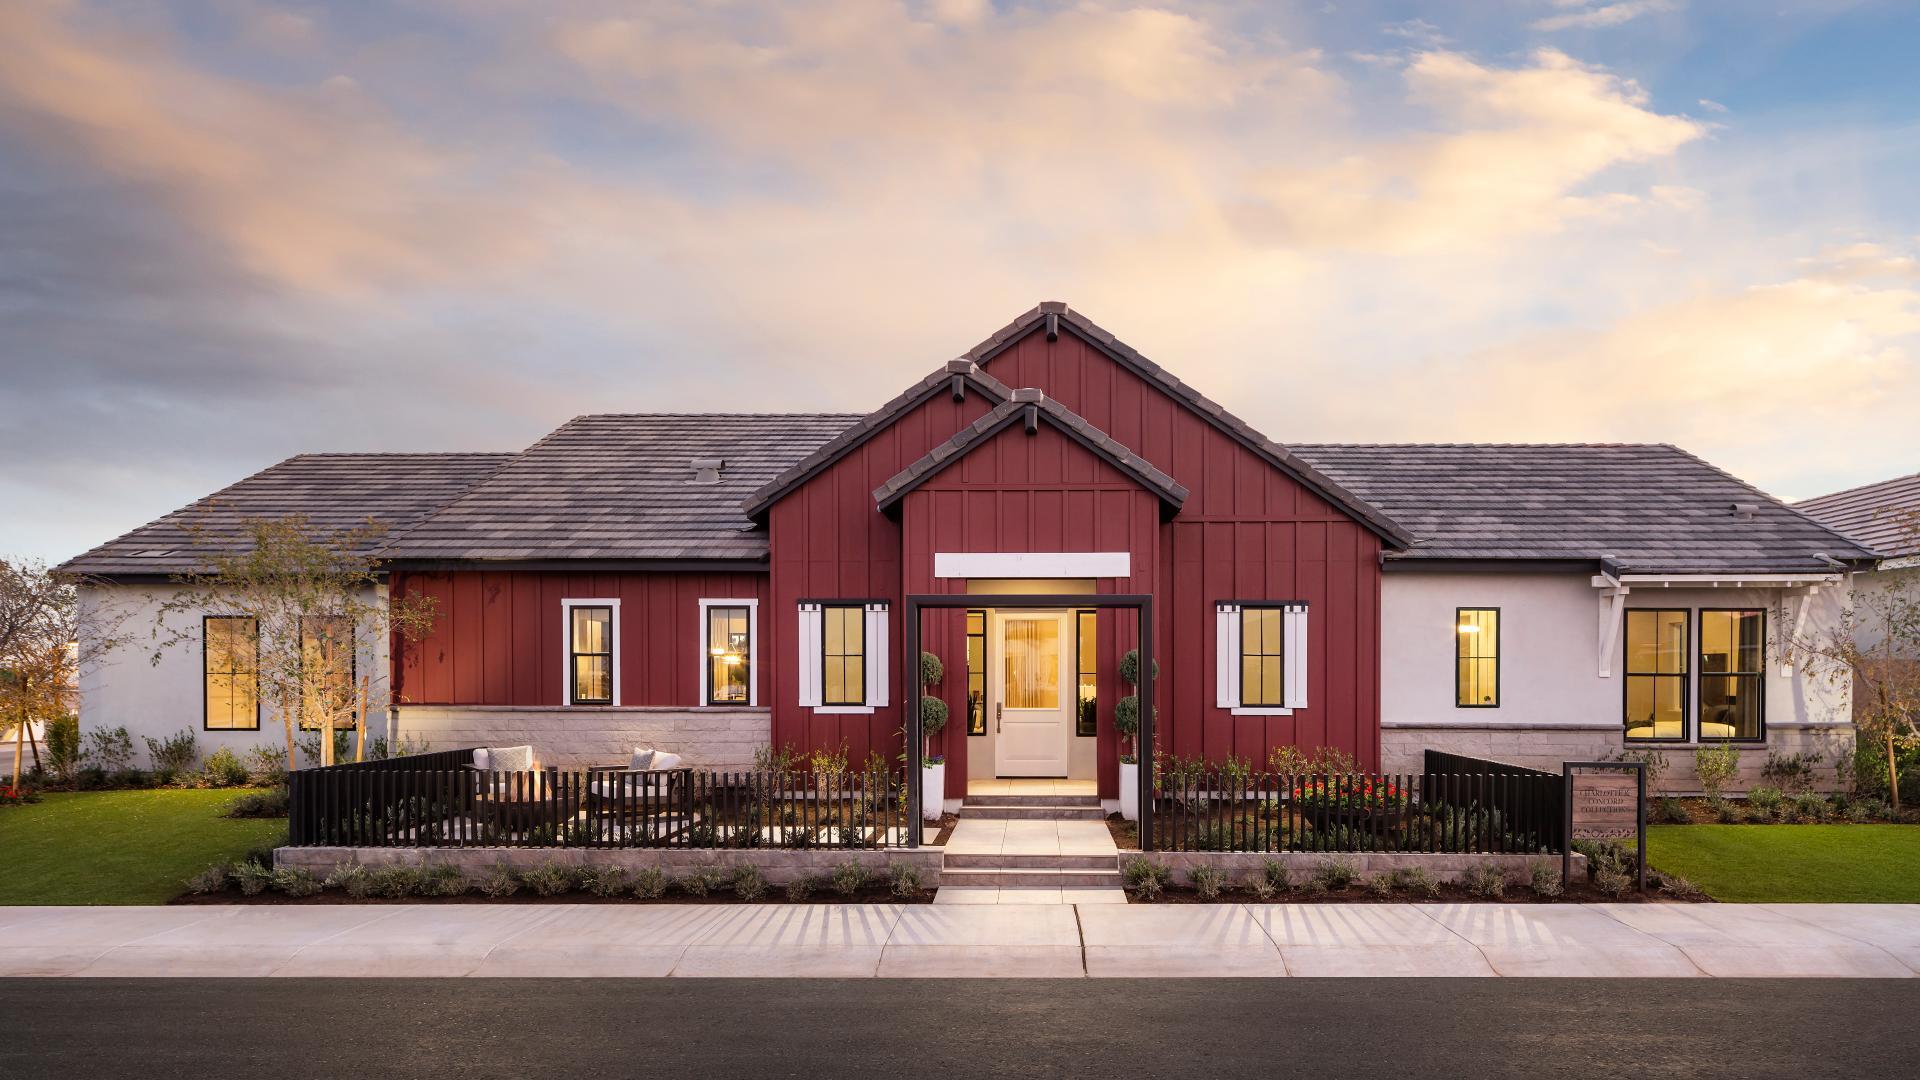 Distinct farmhouse, craftsman, Spanish, and prairie architecture